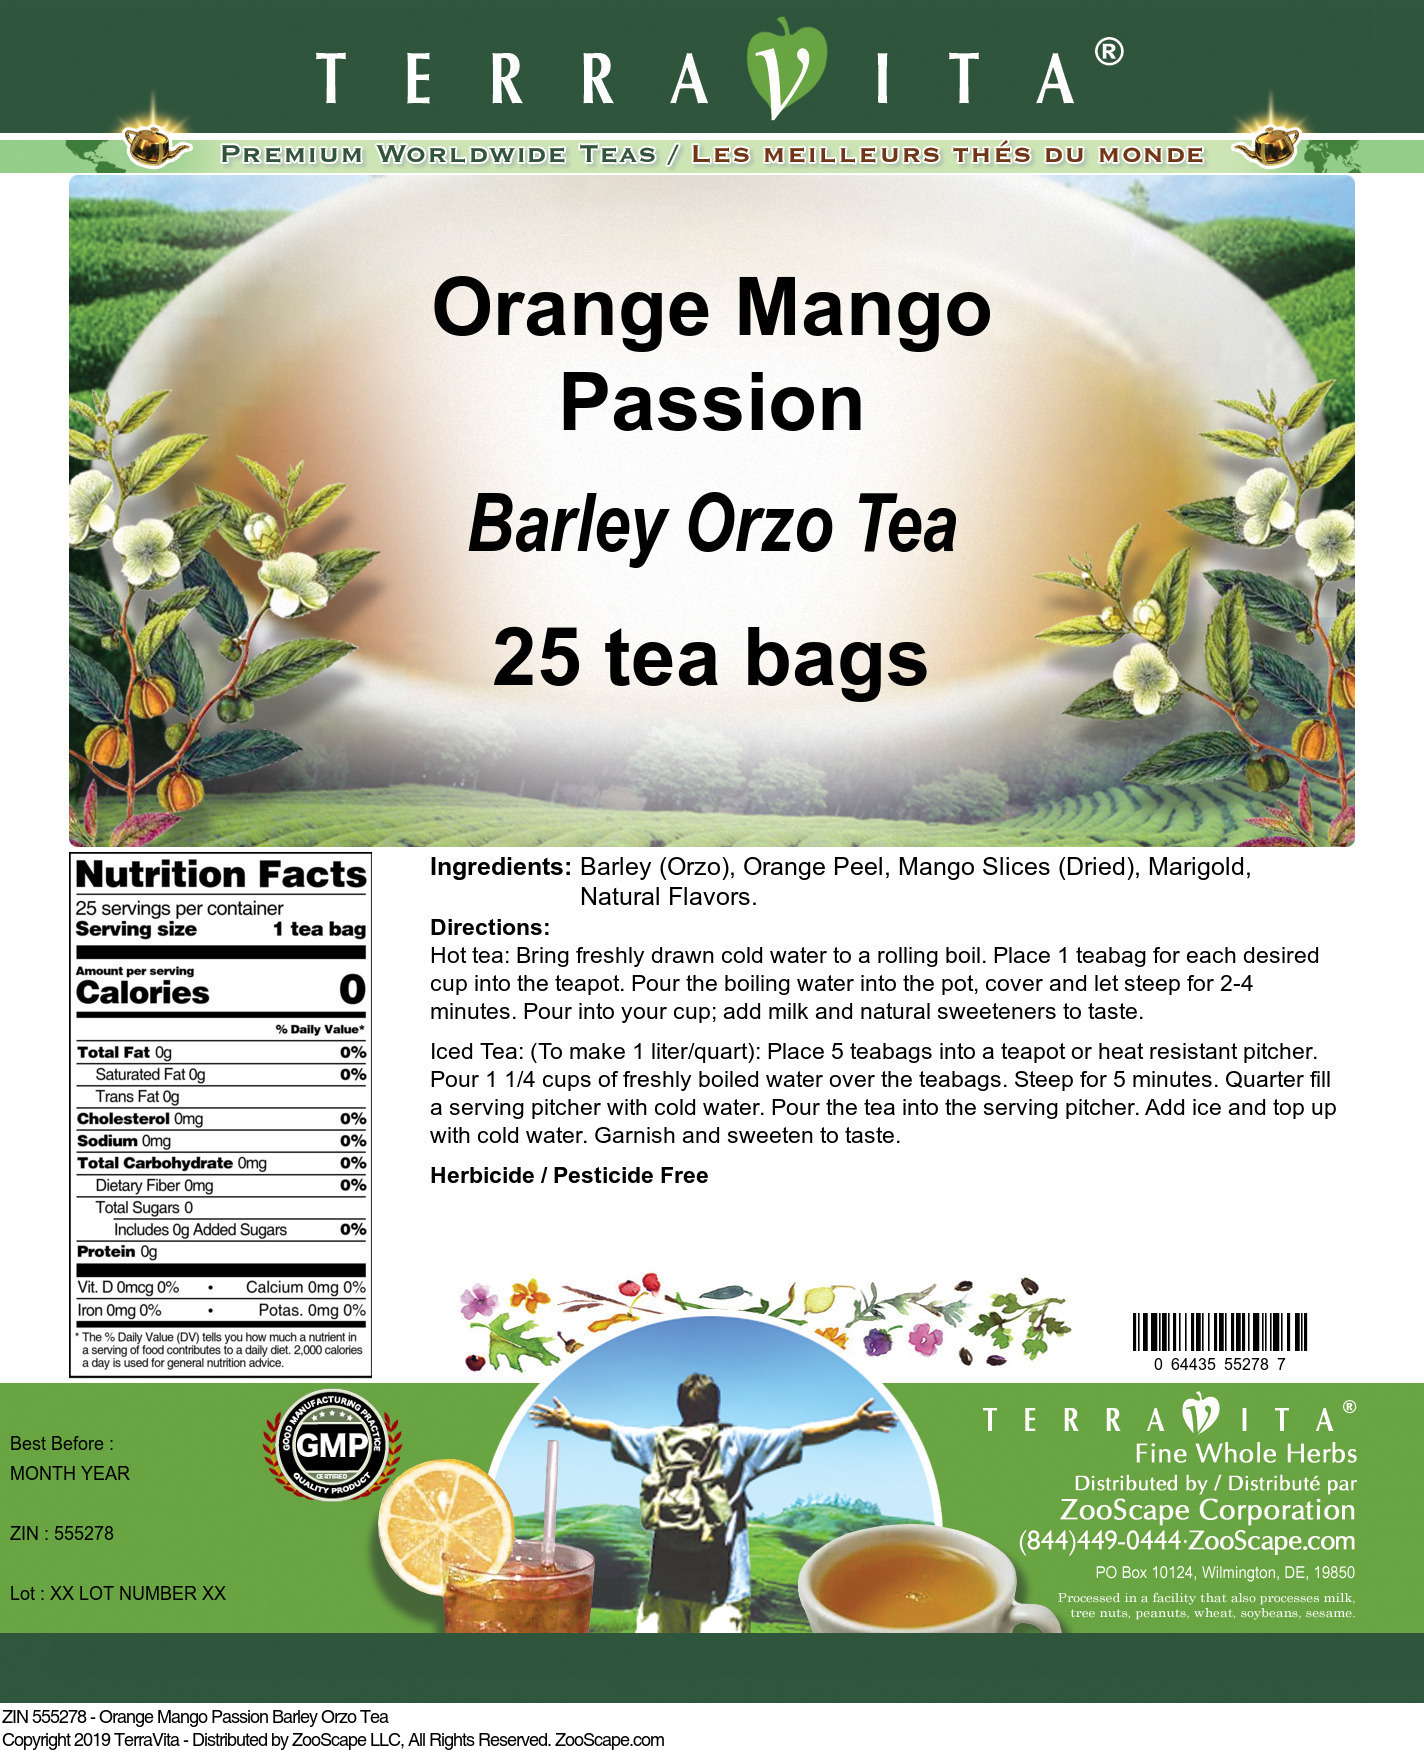 Orange Mango Passion Barley Orzo Tea